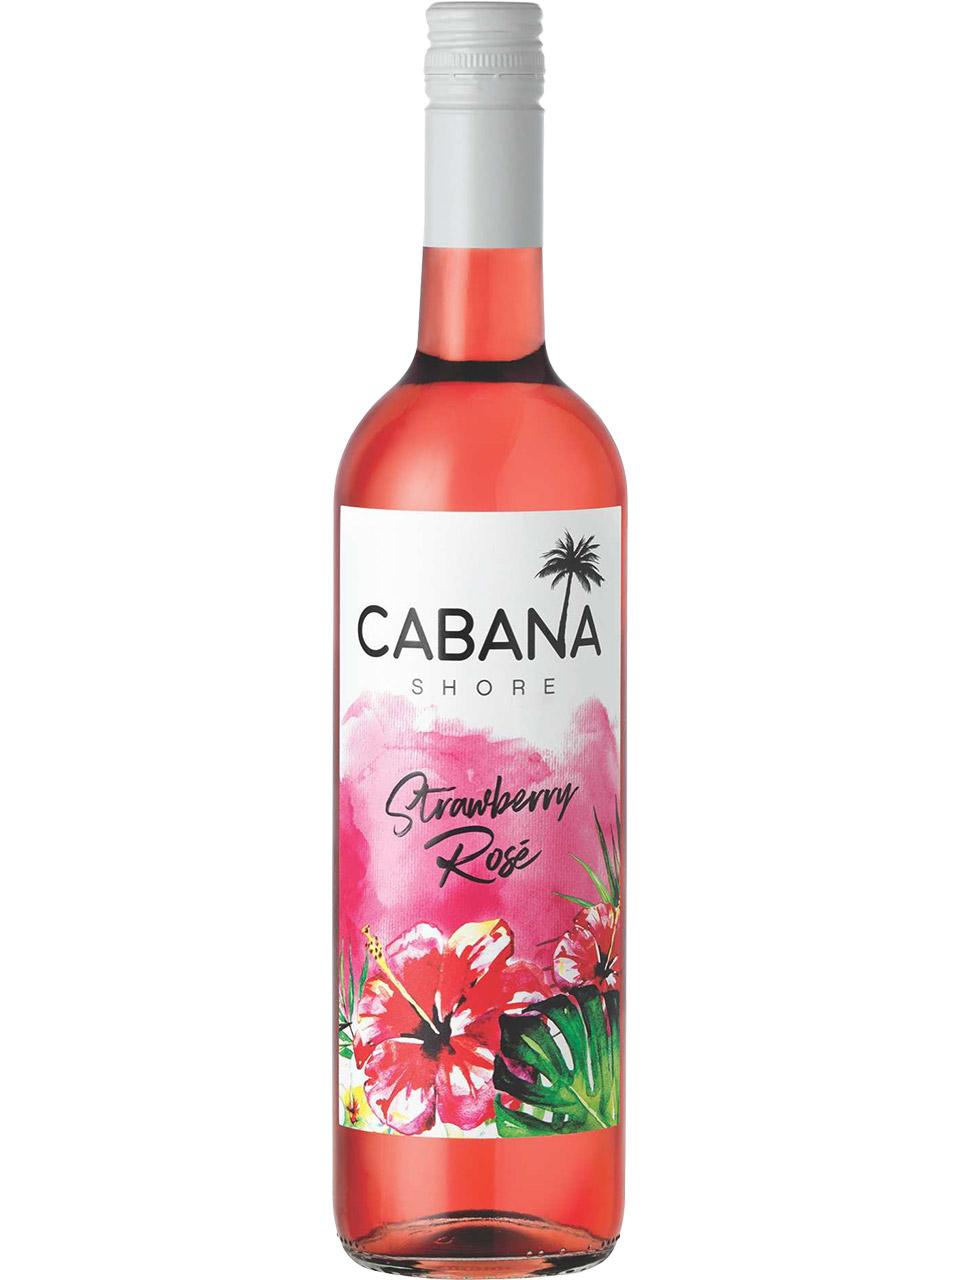 Cabana Shore Strawberry Rose